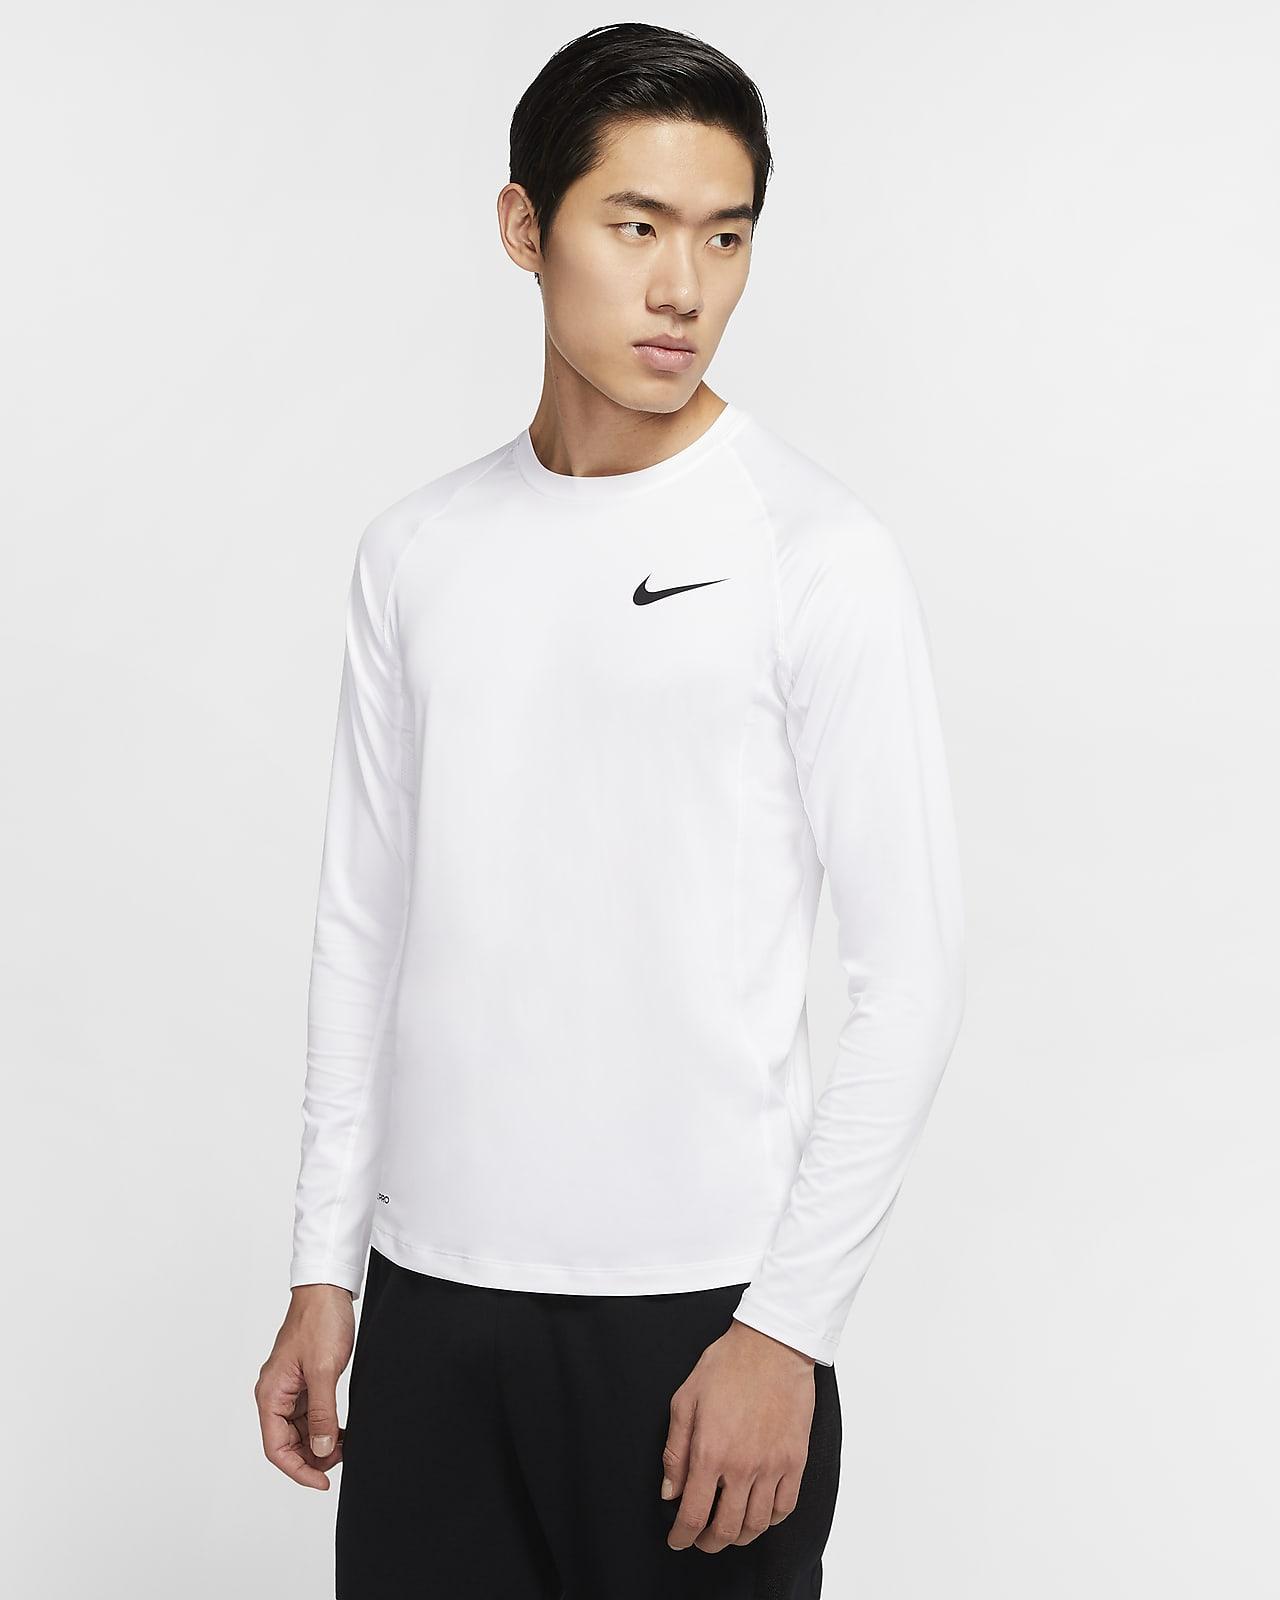 Nike Pro 男子修身版型长袖训练上衣